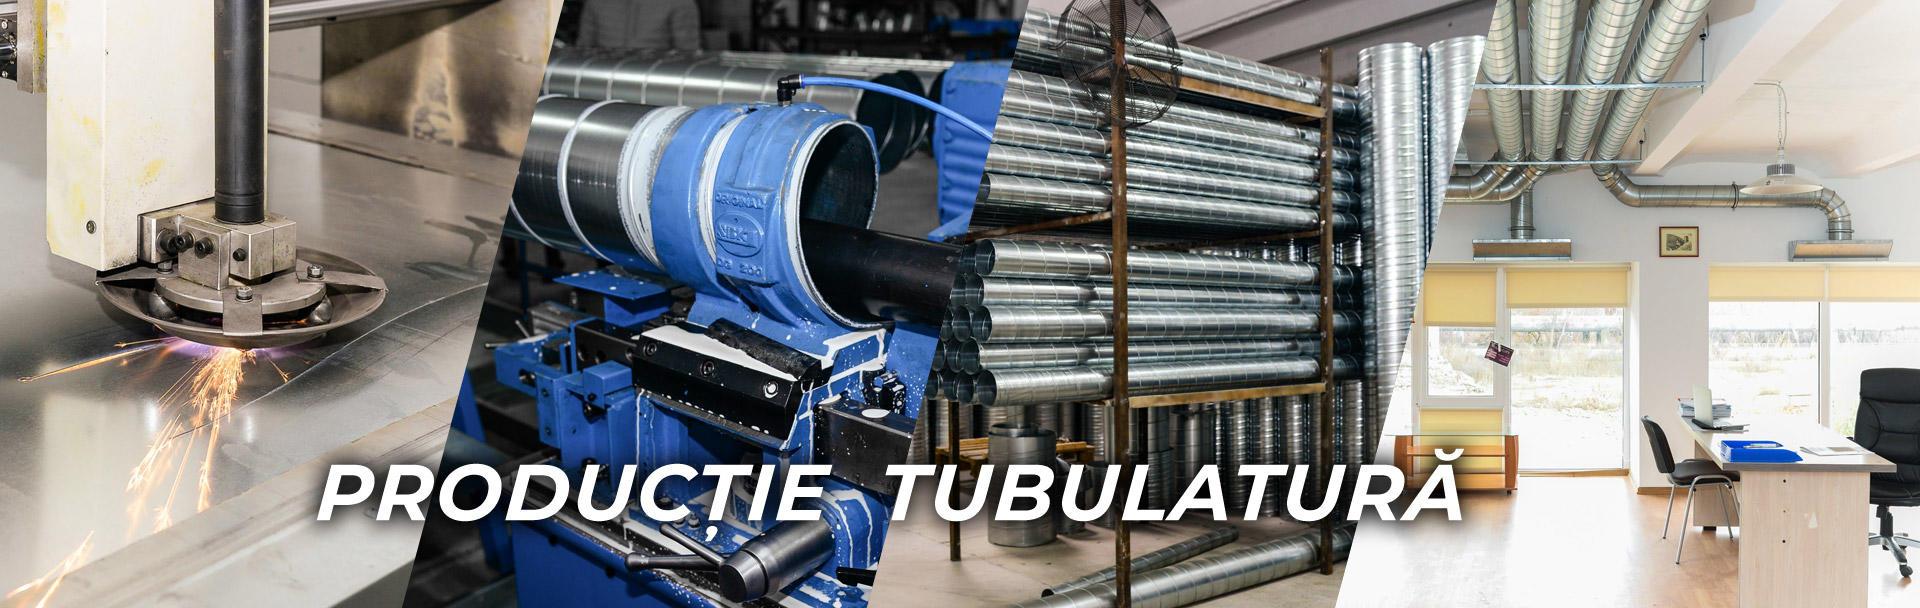 Productie TUBULATURA